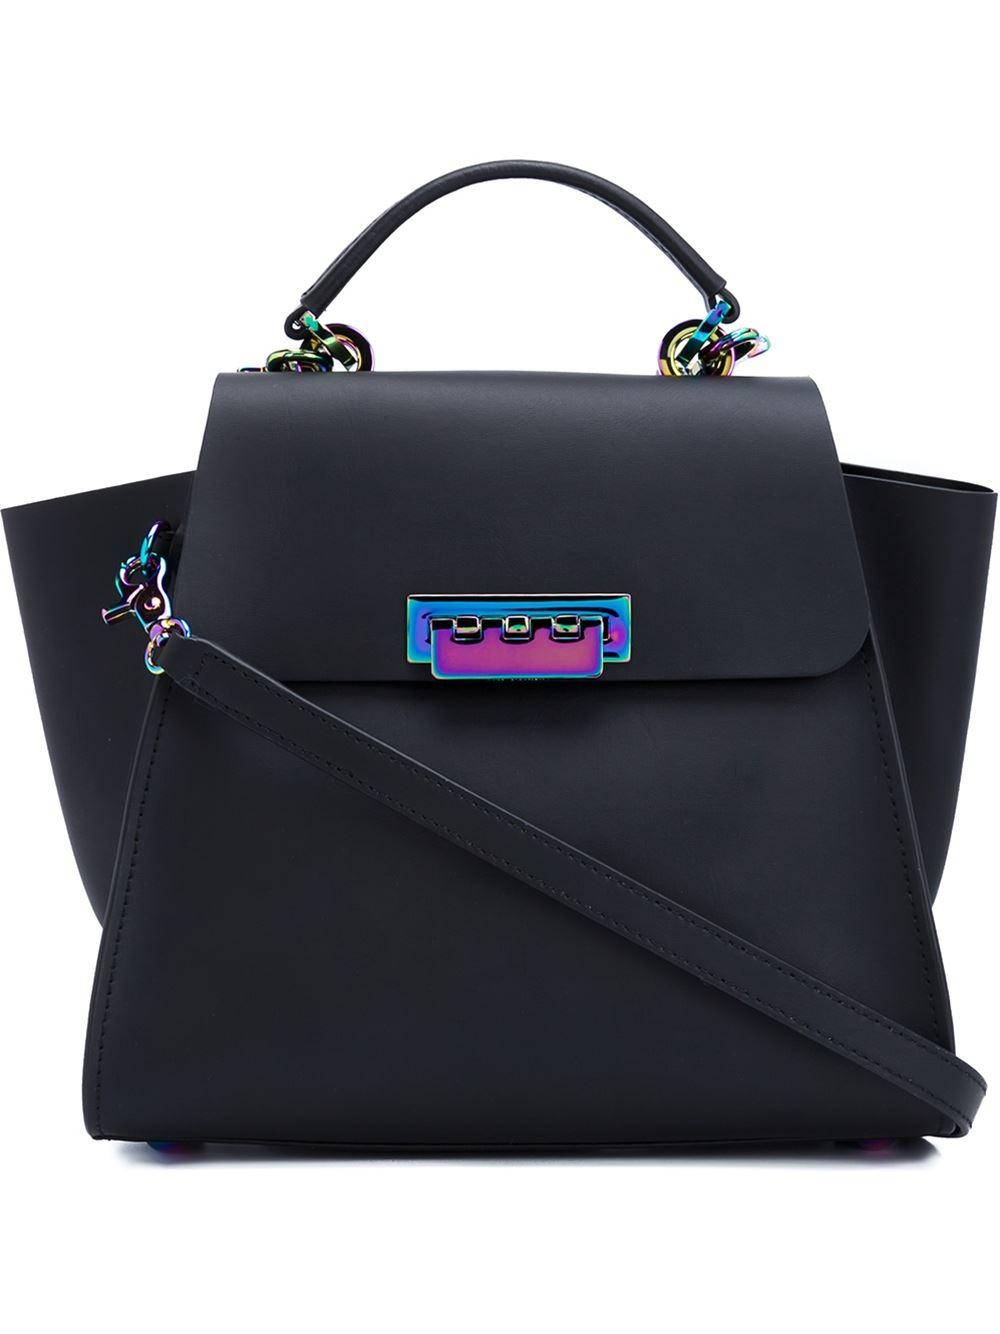 Zac Zac Posen Eartha Iconic Convertible Backpack In Black